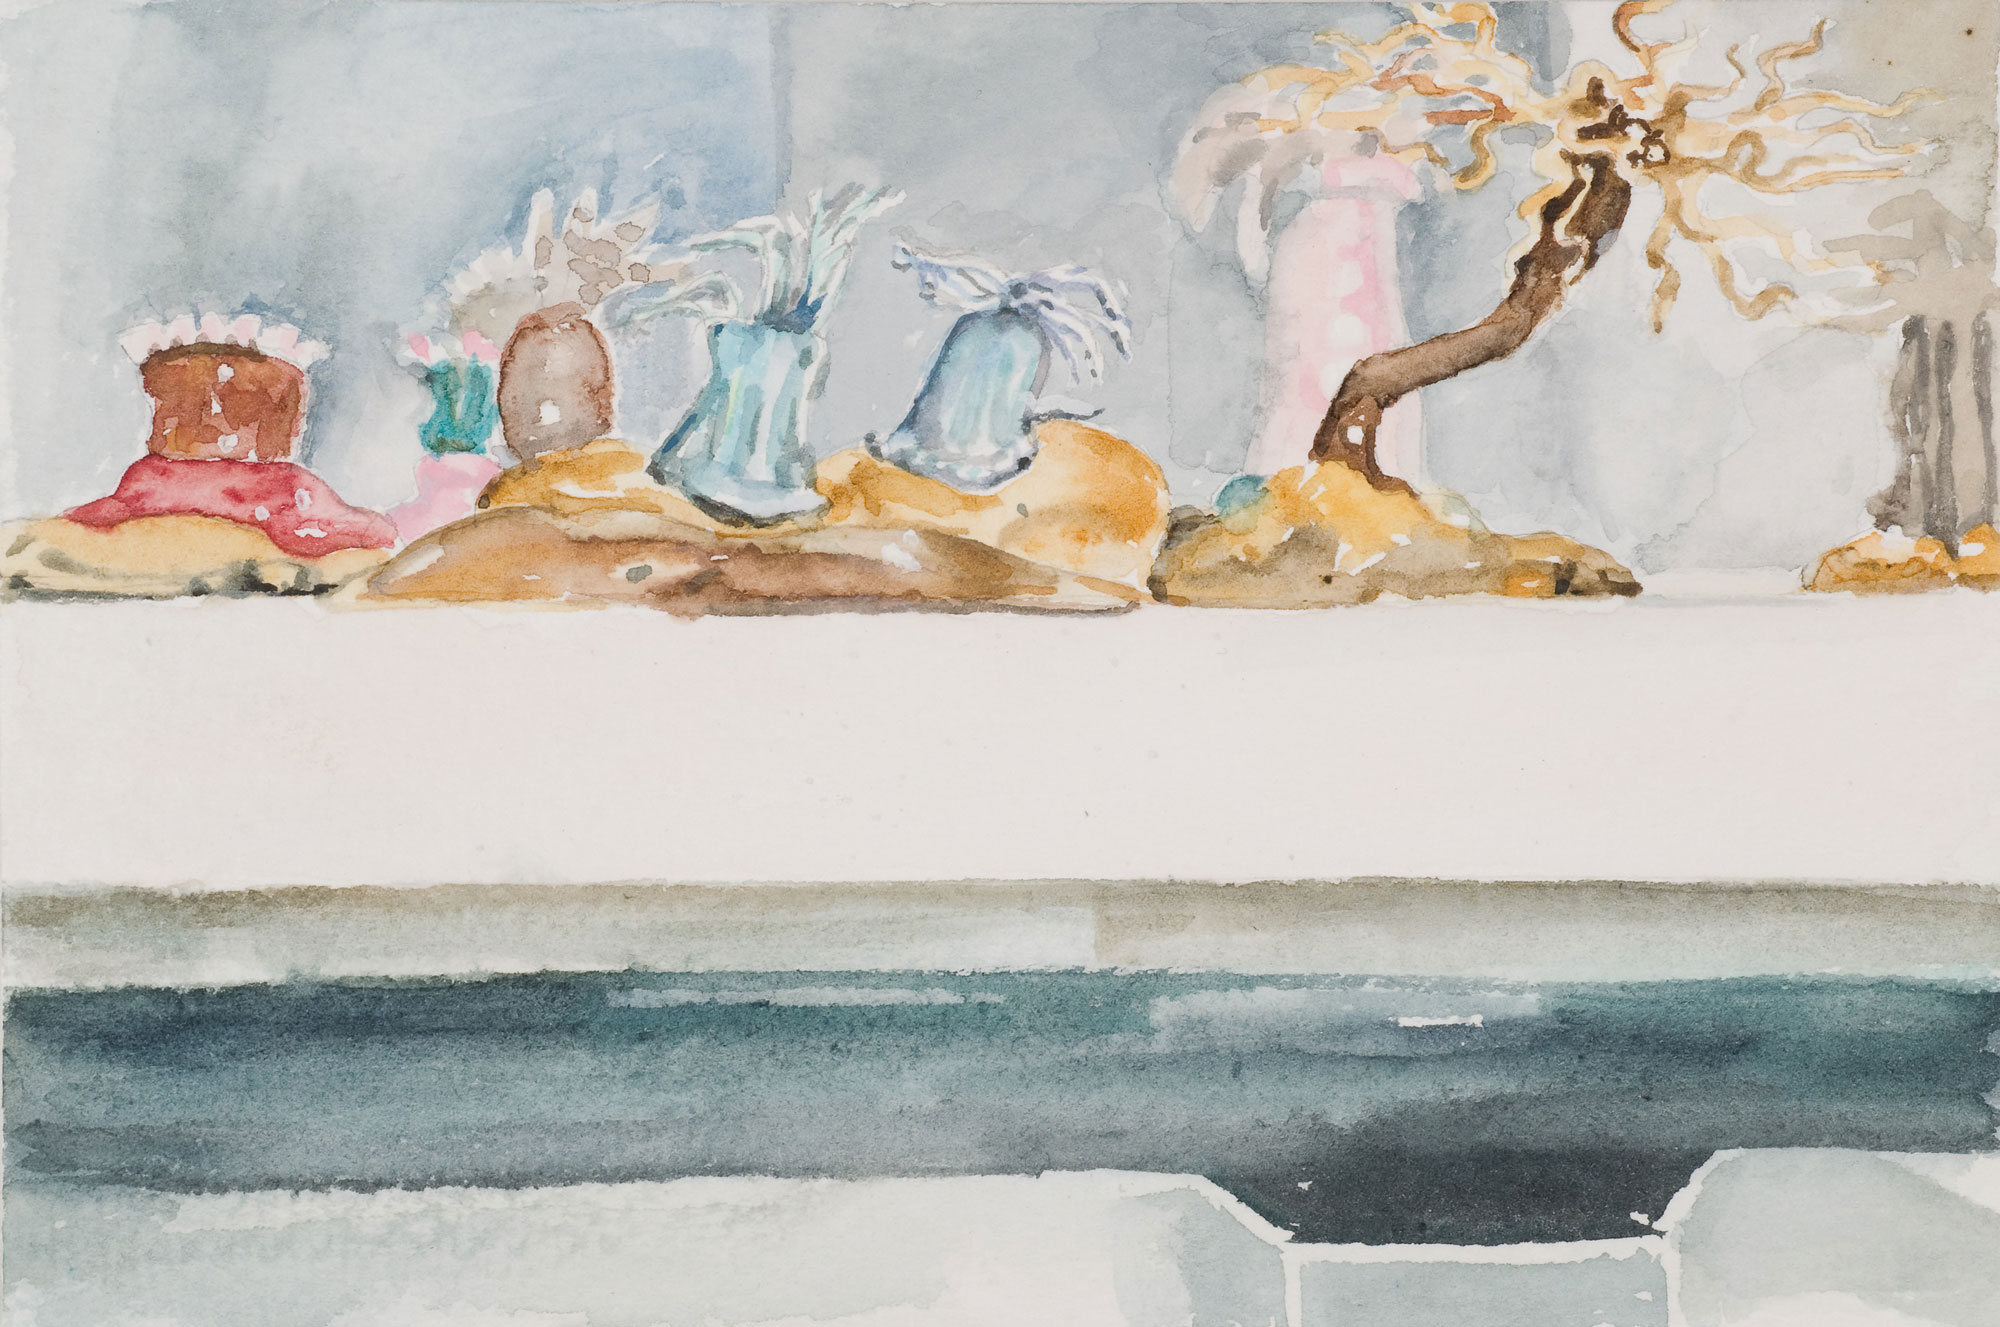 Glass Menagerie #6 , 2008 10 x 14.5cm watercolour